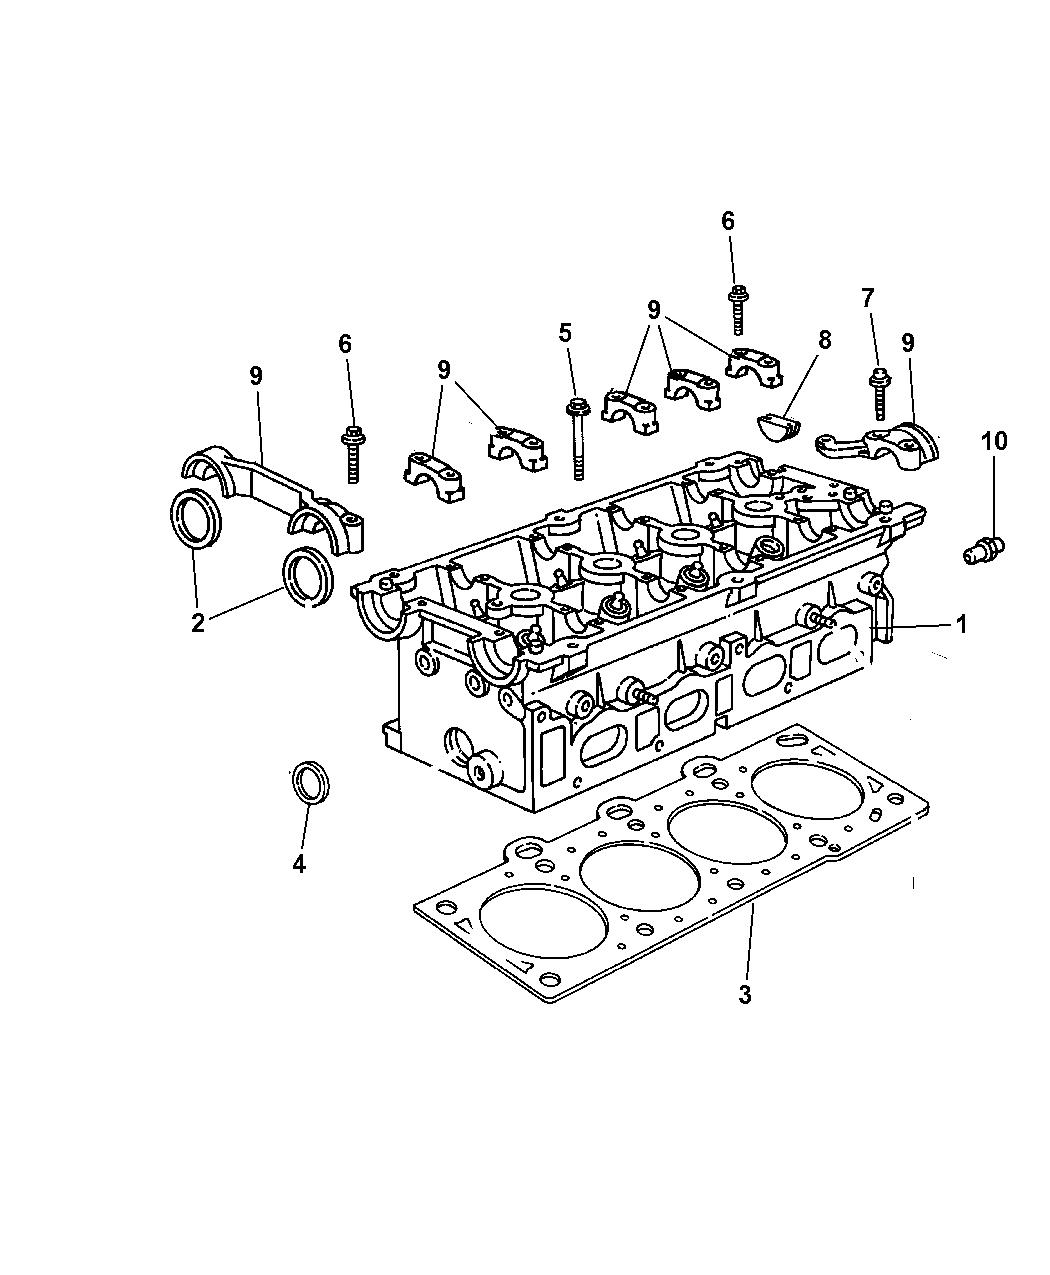 2009 Chrysler Pt Cruiser Cylinder Head Cover Engine Diagram Thumbnail 2